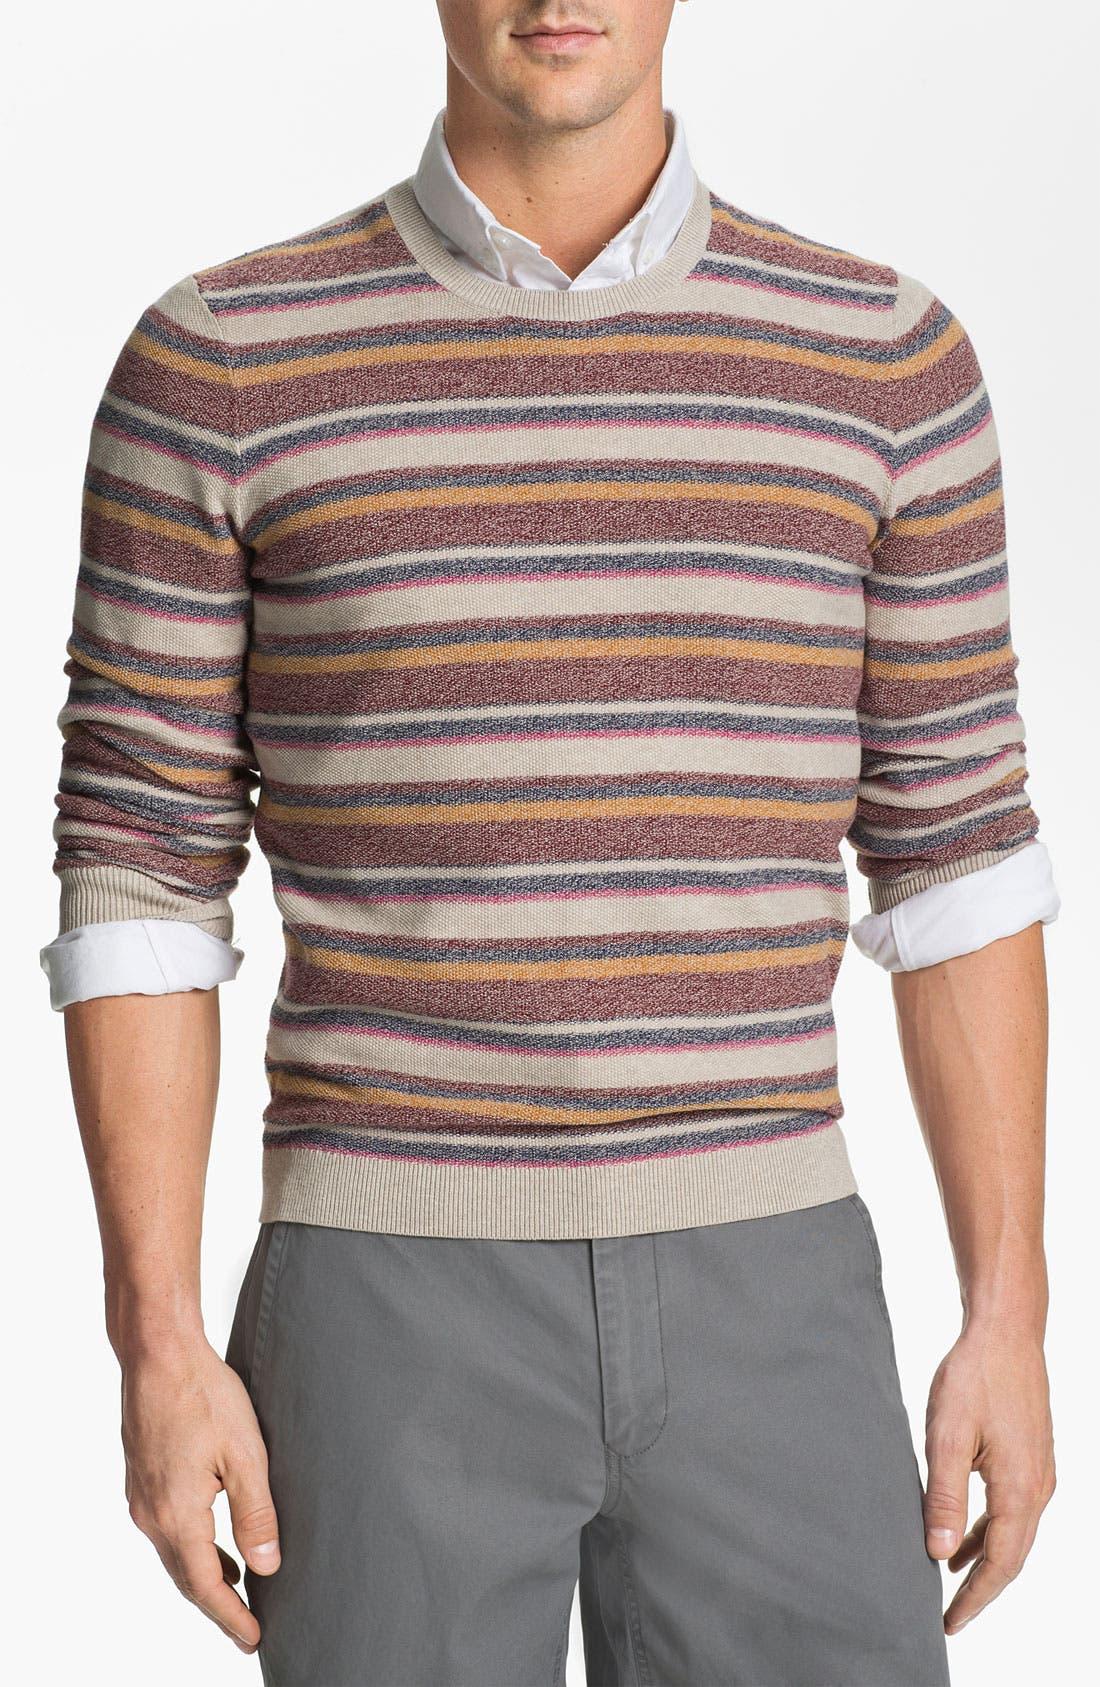 Alternate Image 1 Selected - Ted Baker London 'Dextar' Crewneck Sweater